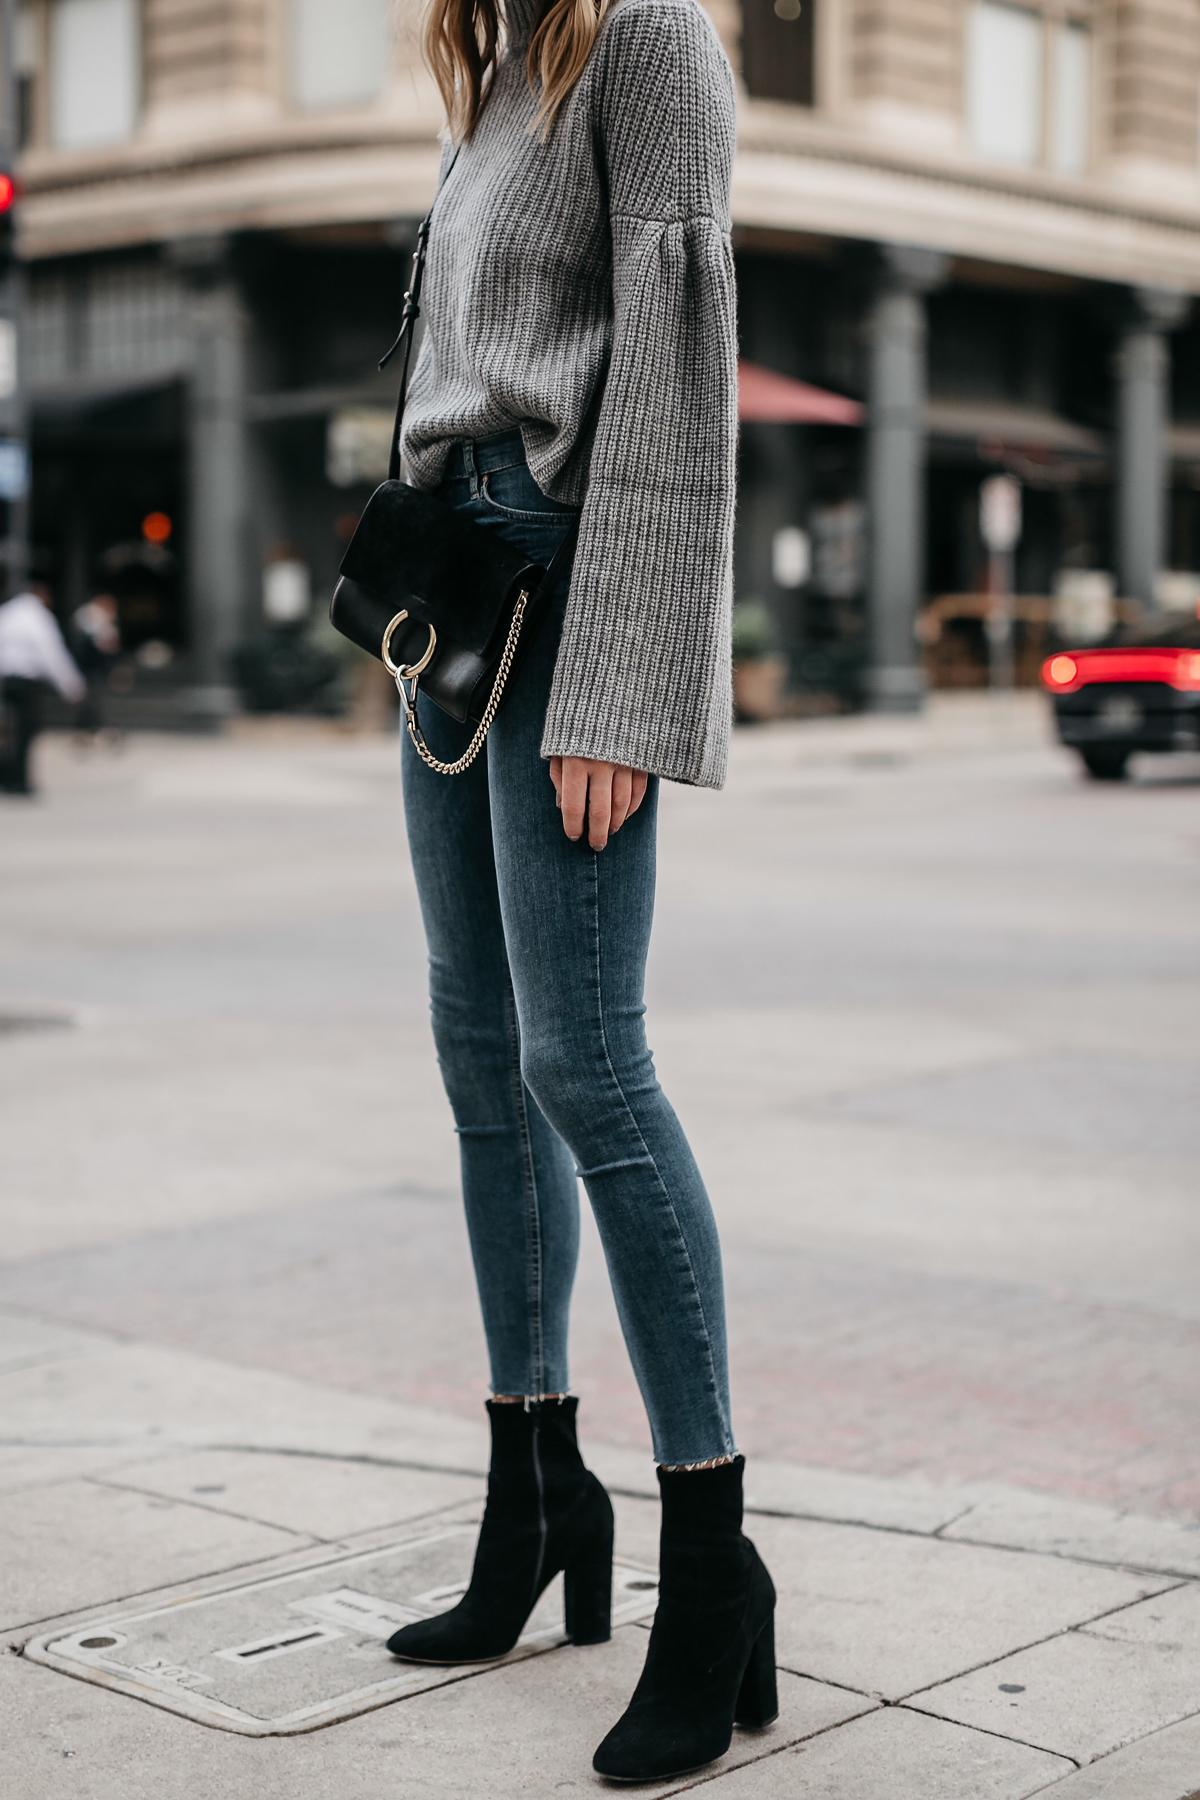 Grey Bell Sleeve Sweater Denim Skinny Jeans Chloe Faye Black Handbag Black Booties Fashion Jackson Dallas Blogger Fashion Blogger Street Style